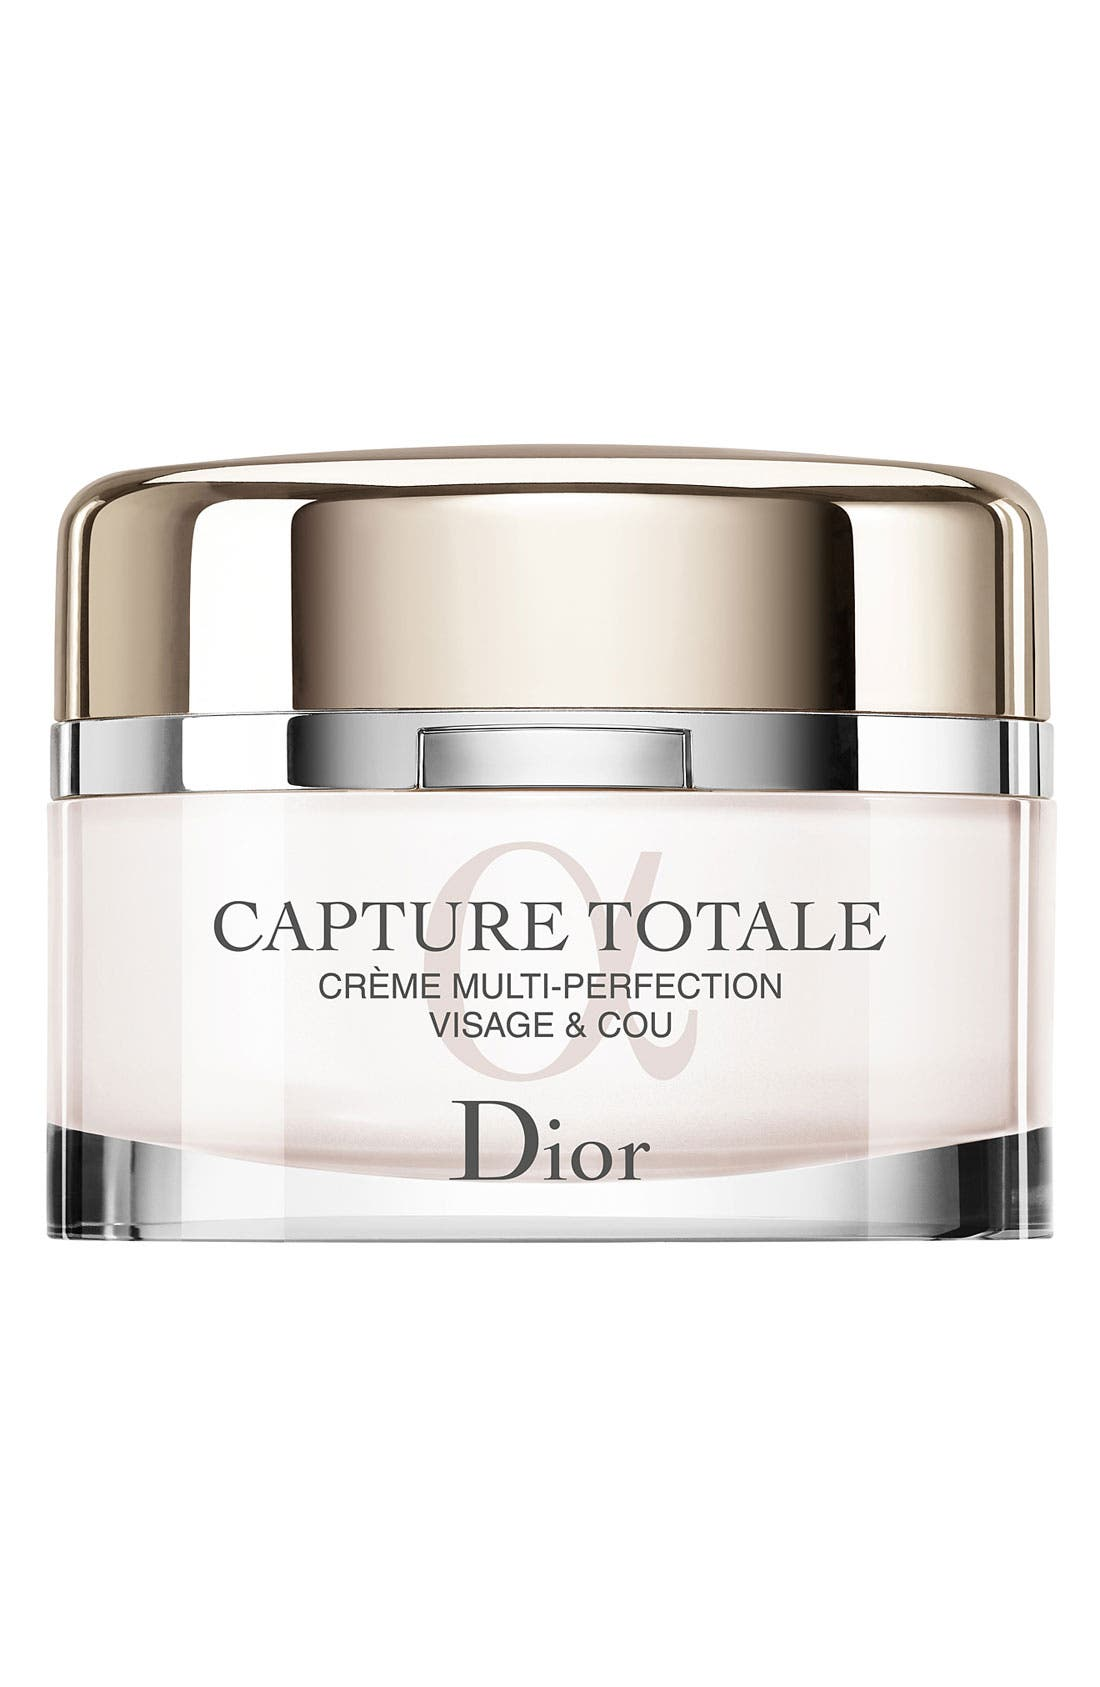 Dior 'Capture Totale' Multi-Perfection Crème for Face & Neck